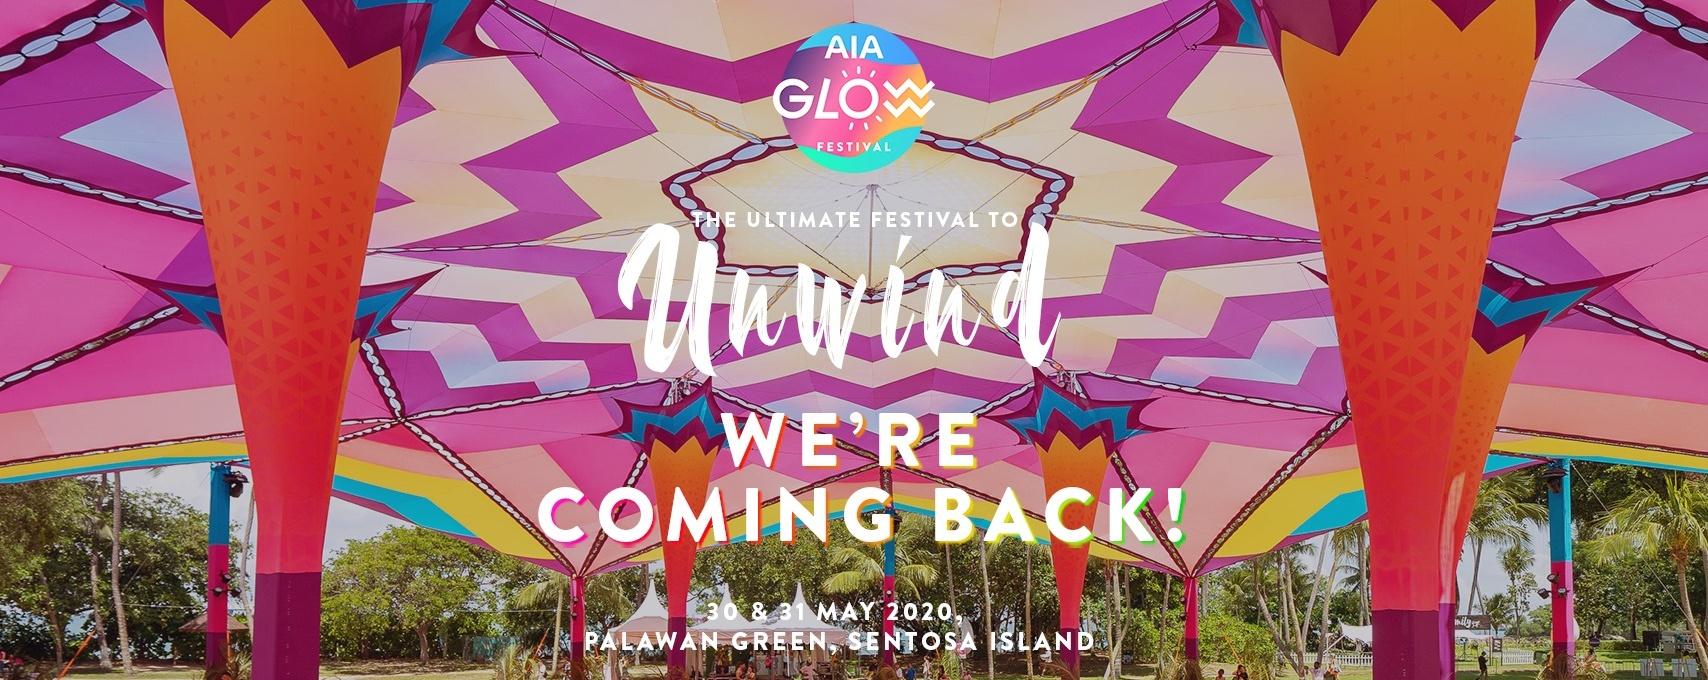 [POSTPONED] AIA Glow Festival